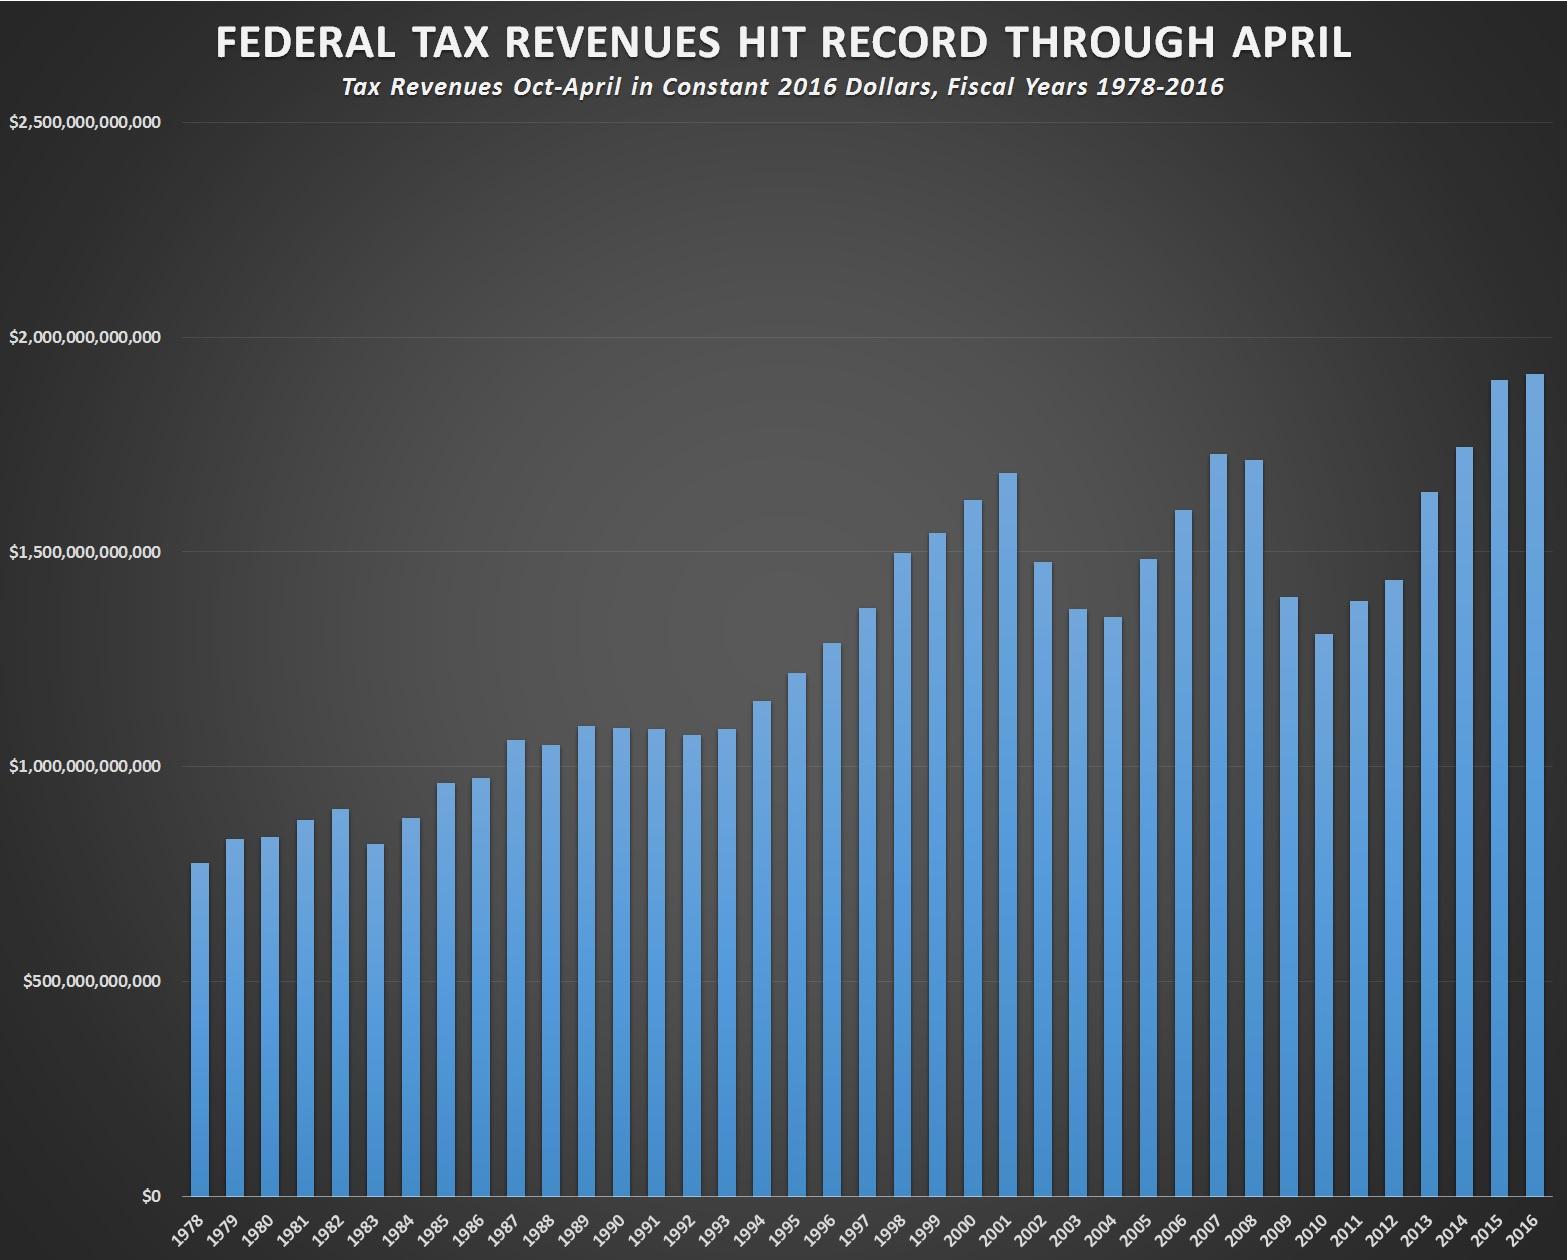 1 914 651 000 000 Fy Taxes Set Record Through April 12 679 Per Worker Feds Still Run